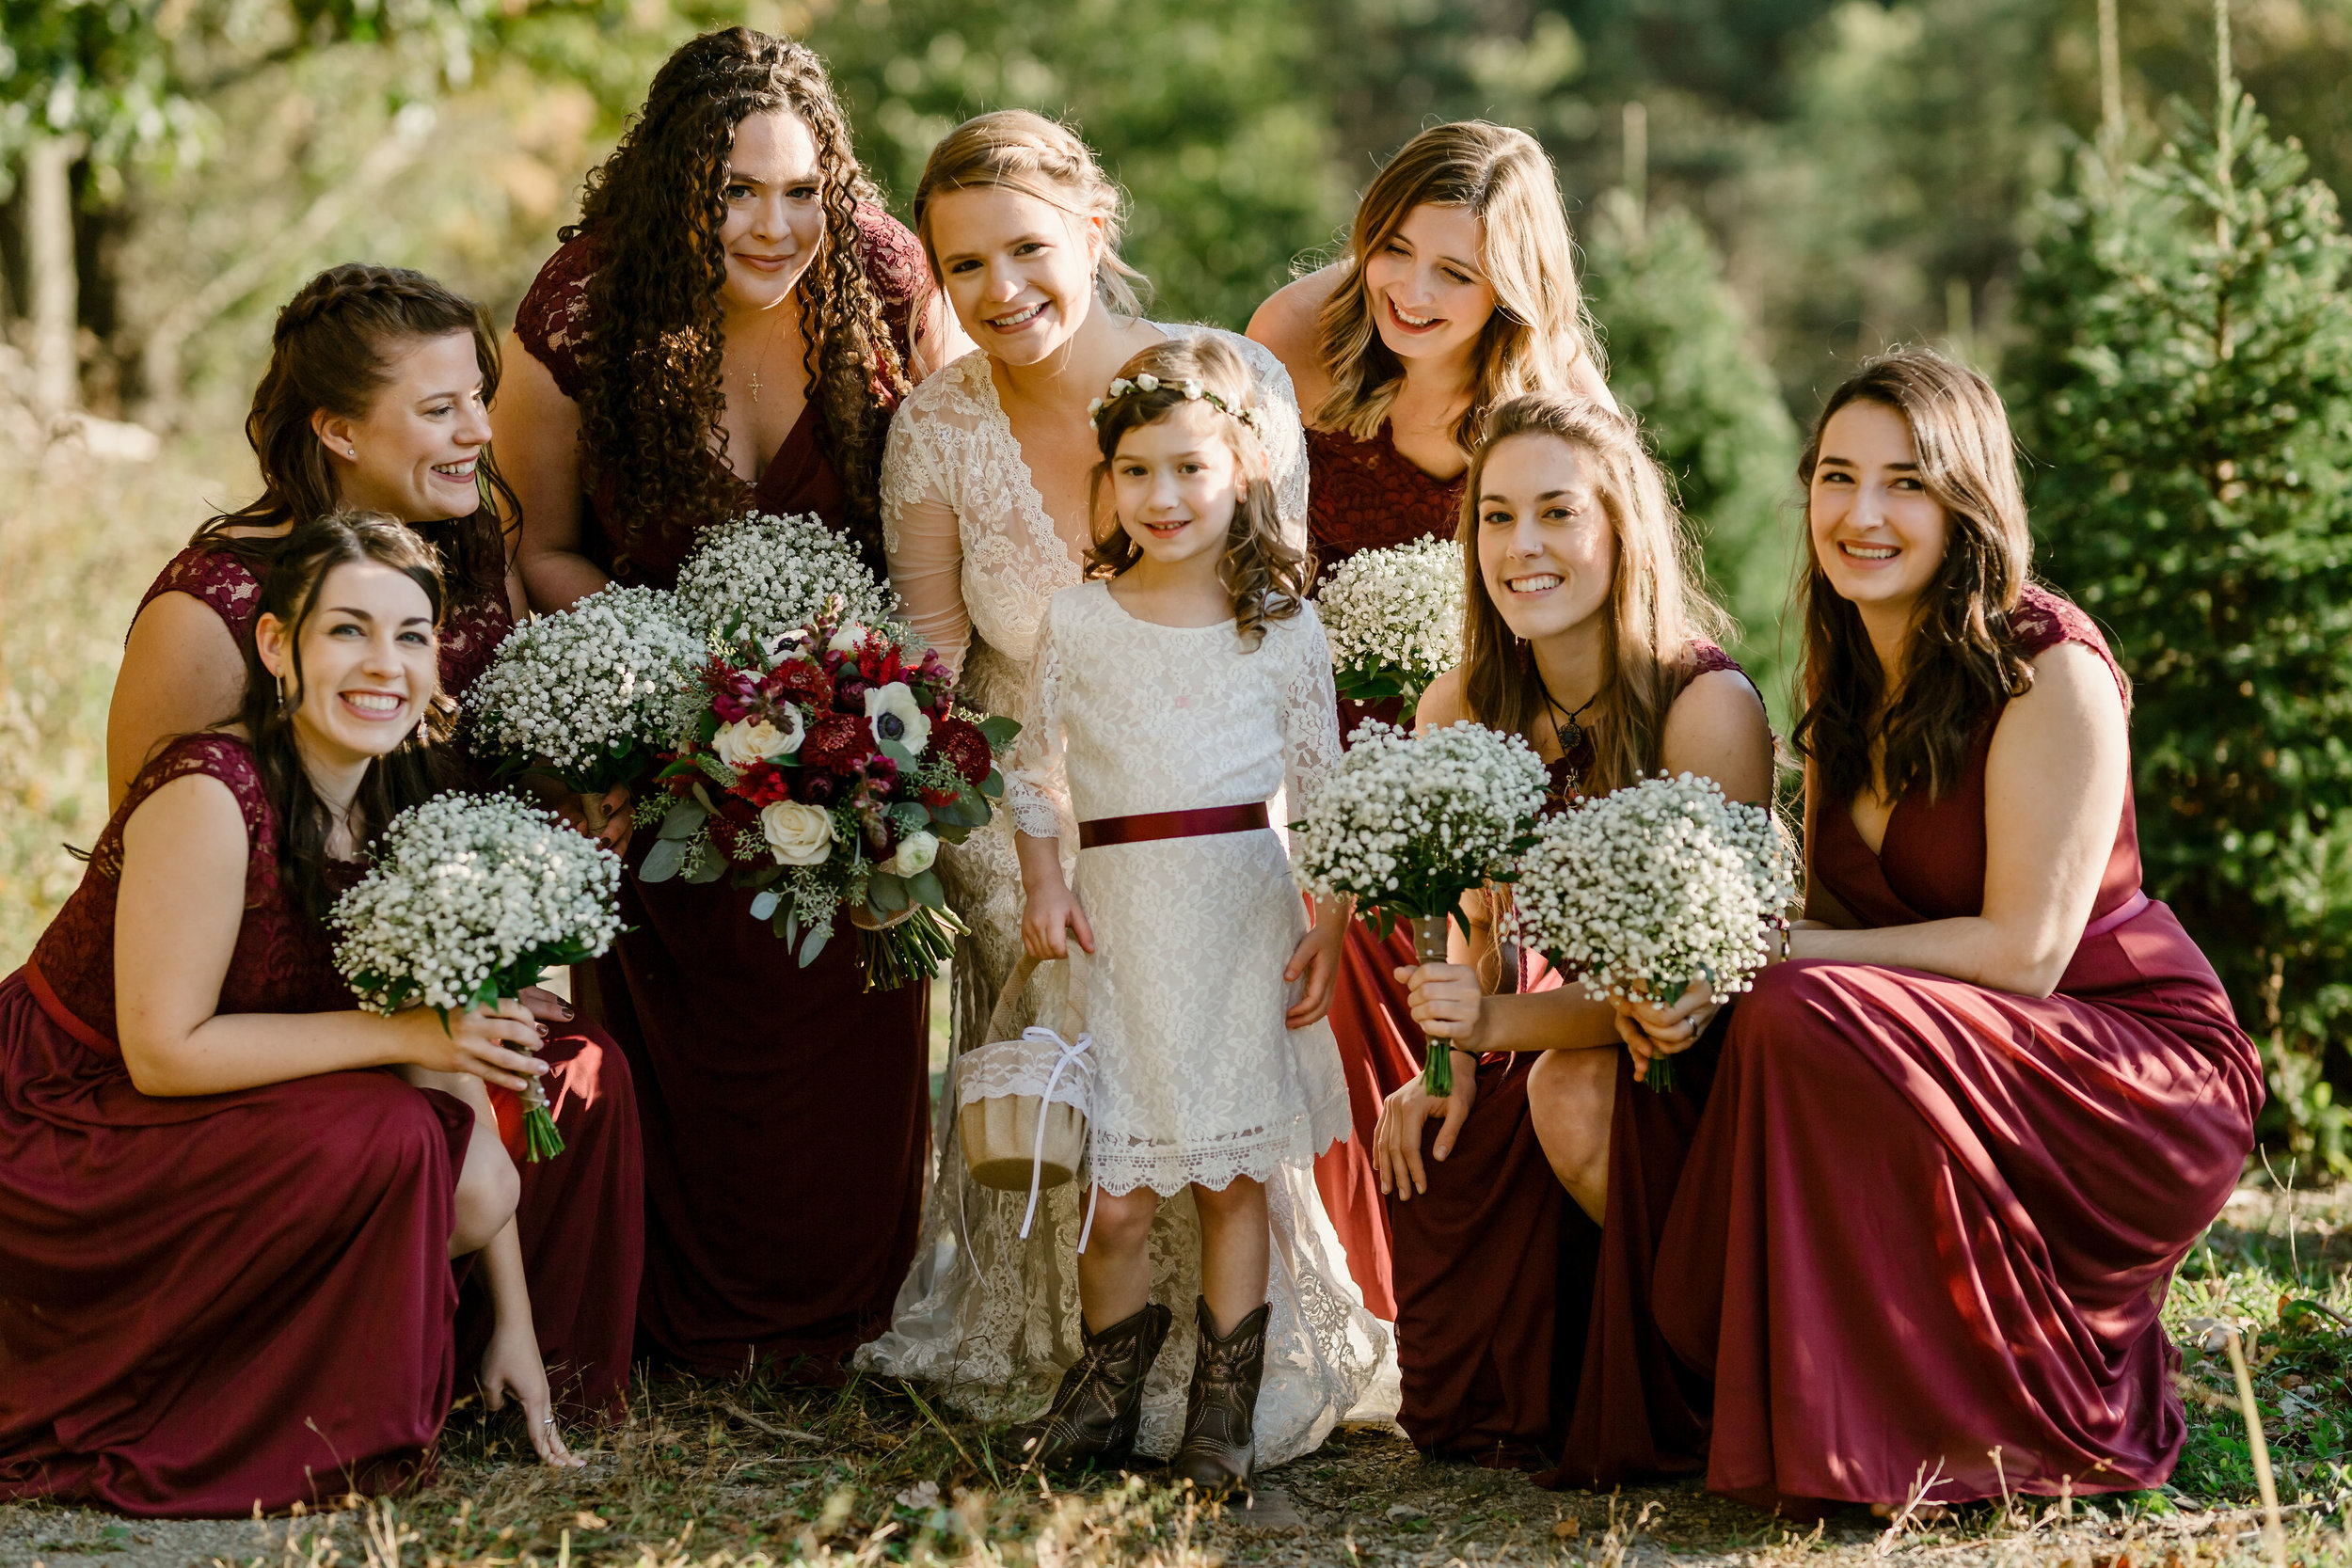 young-love-media-rustic-fall-autumn-wedding-emmerich-tree-farm-hudson-valley-warwick-new-york-ceremony-57.jpg